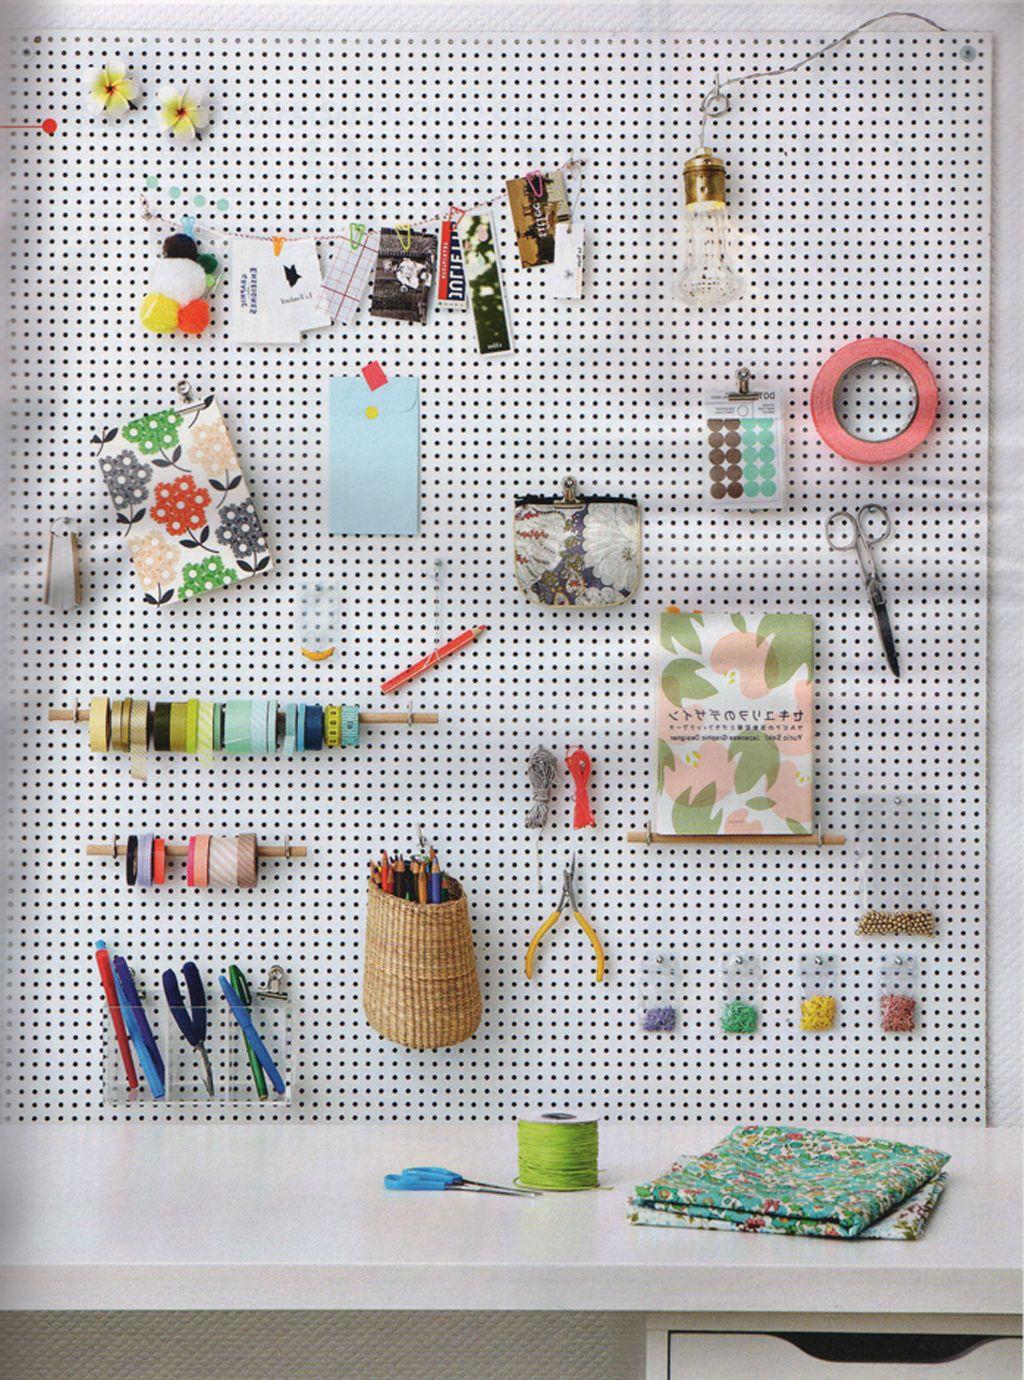 Pinnwand Selber Machen pinnwand selber machen 6 kreative ideen mit anleitungen room